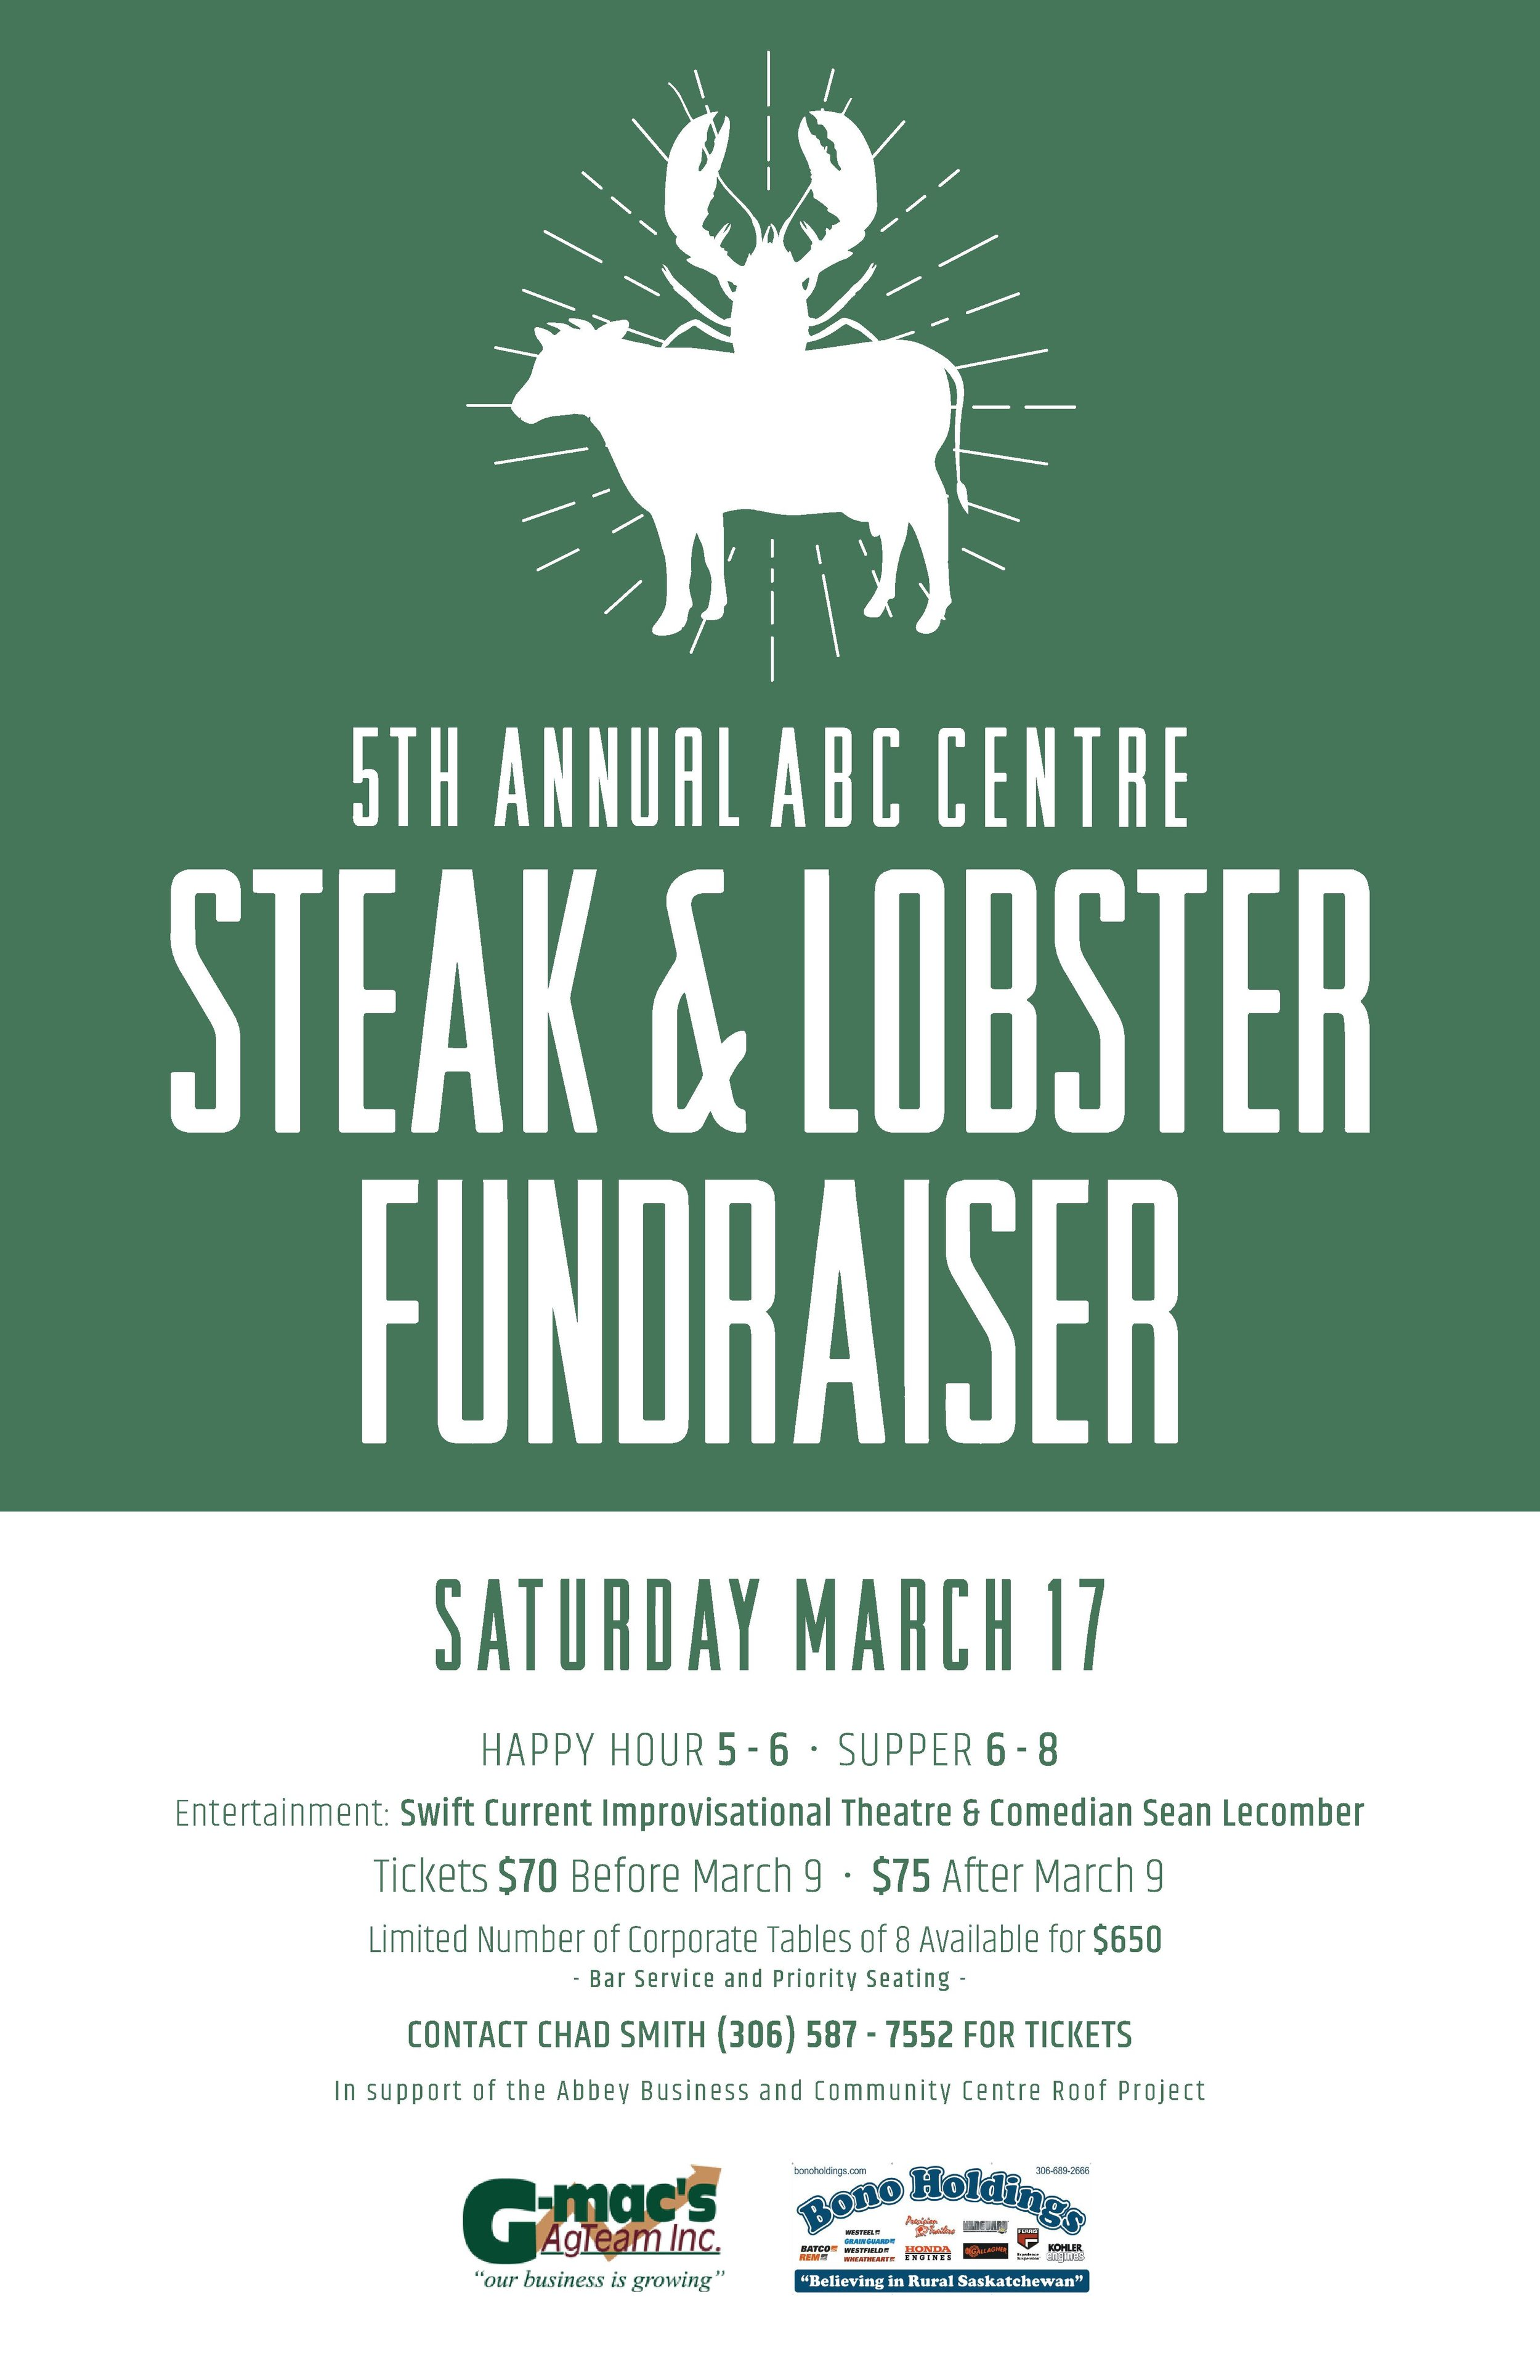 abc-steak-lobster.jpg